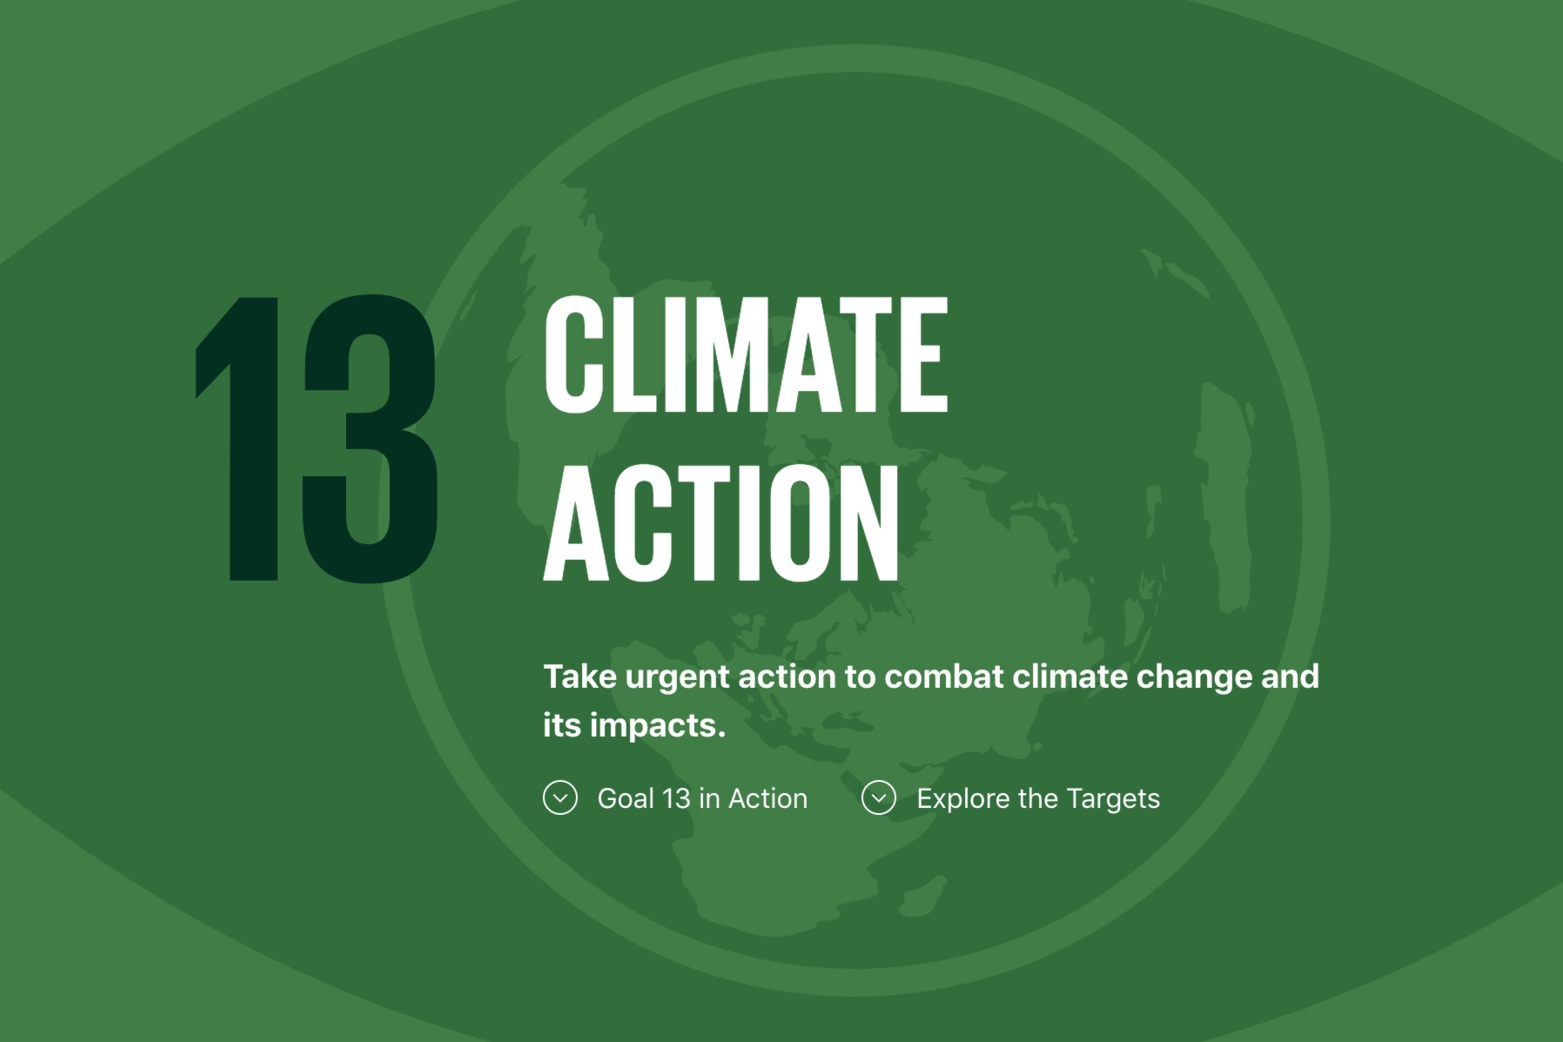 - SDG 13: Climate Action